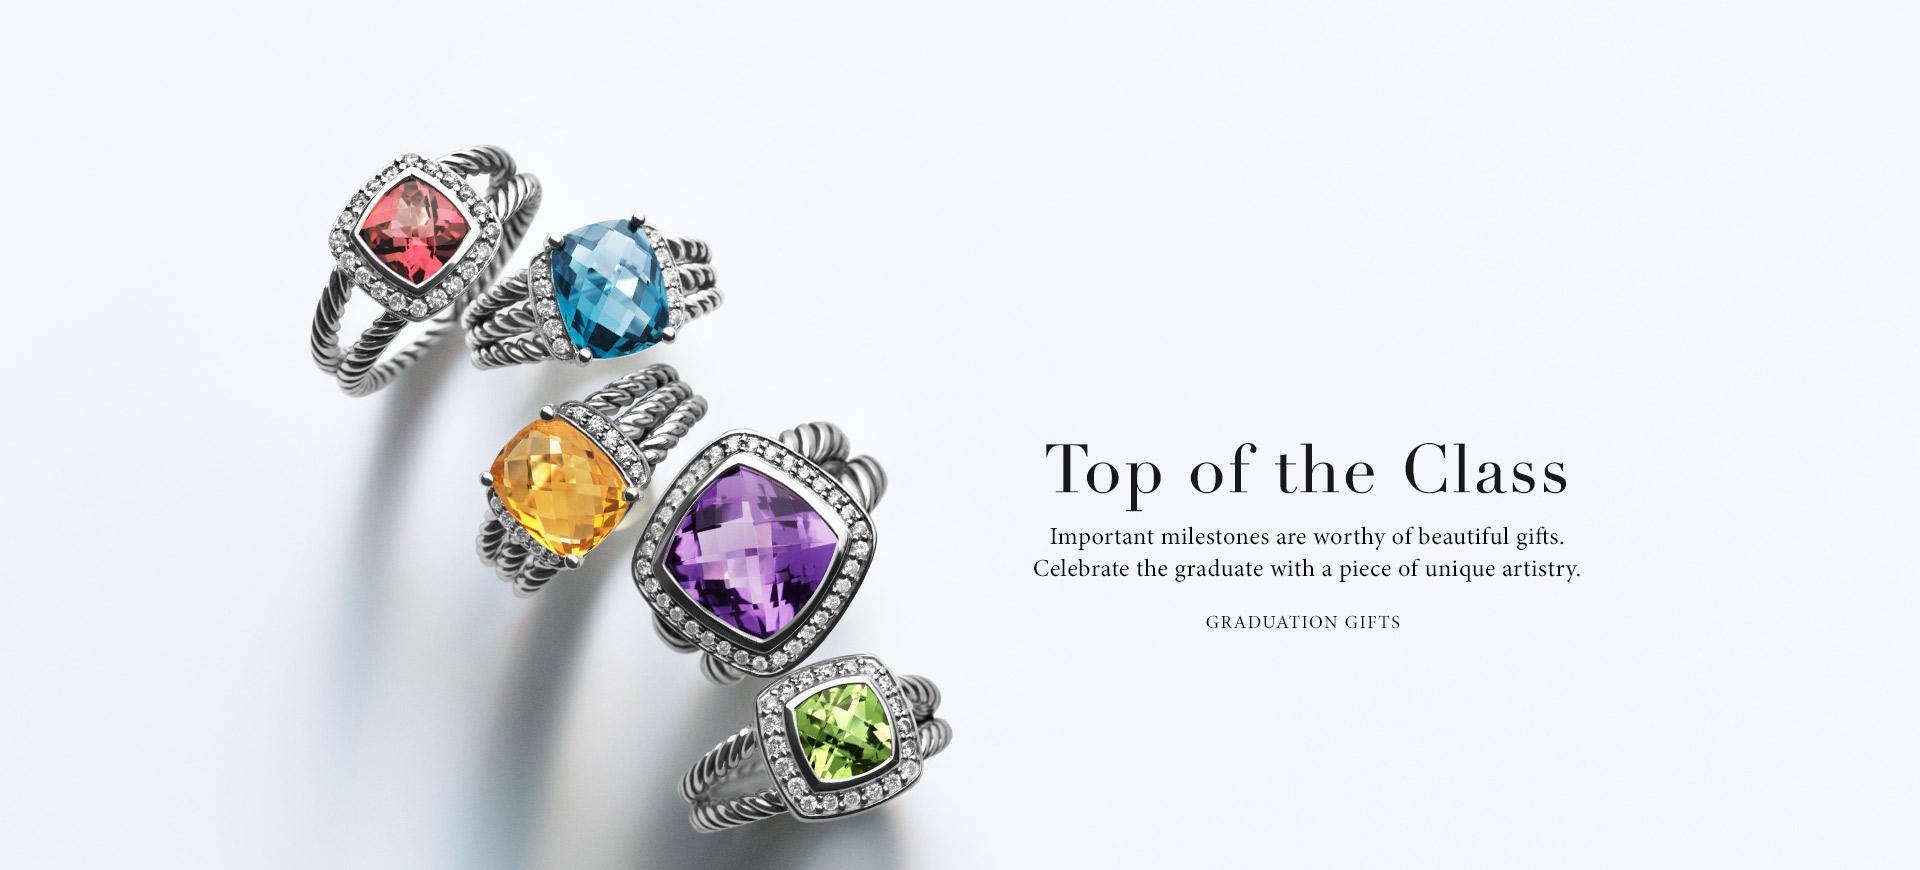 david yurman wedding rings David Yurman Designer Jewelry Luxury Timepieces Bracelets Engagement Rings Necklaces